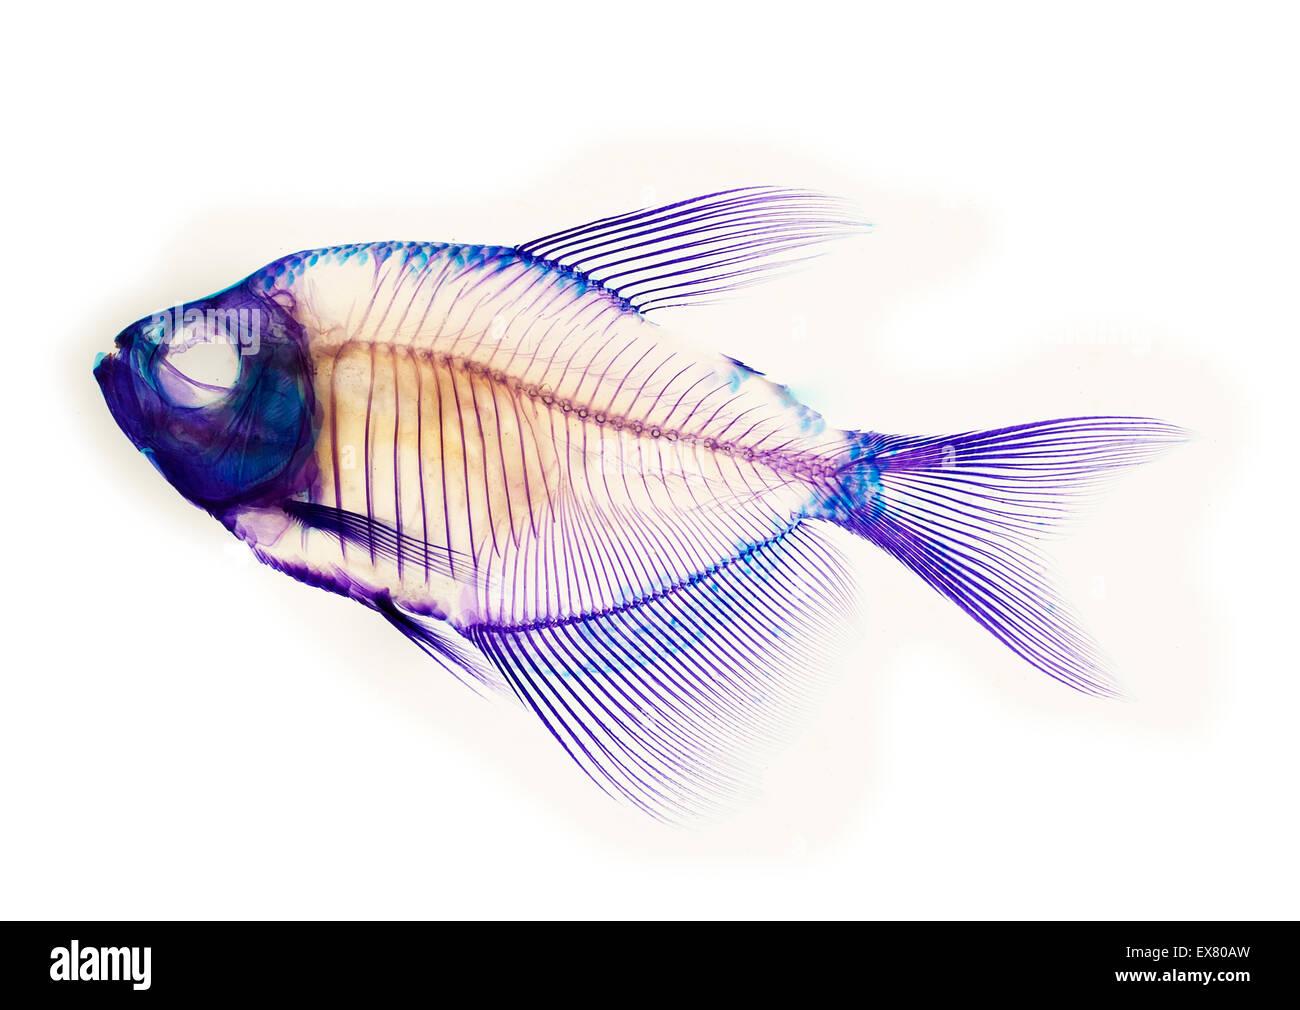 fish skeleton anatomy Stock Photo: 84998449 - Alamy